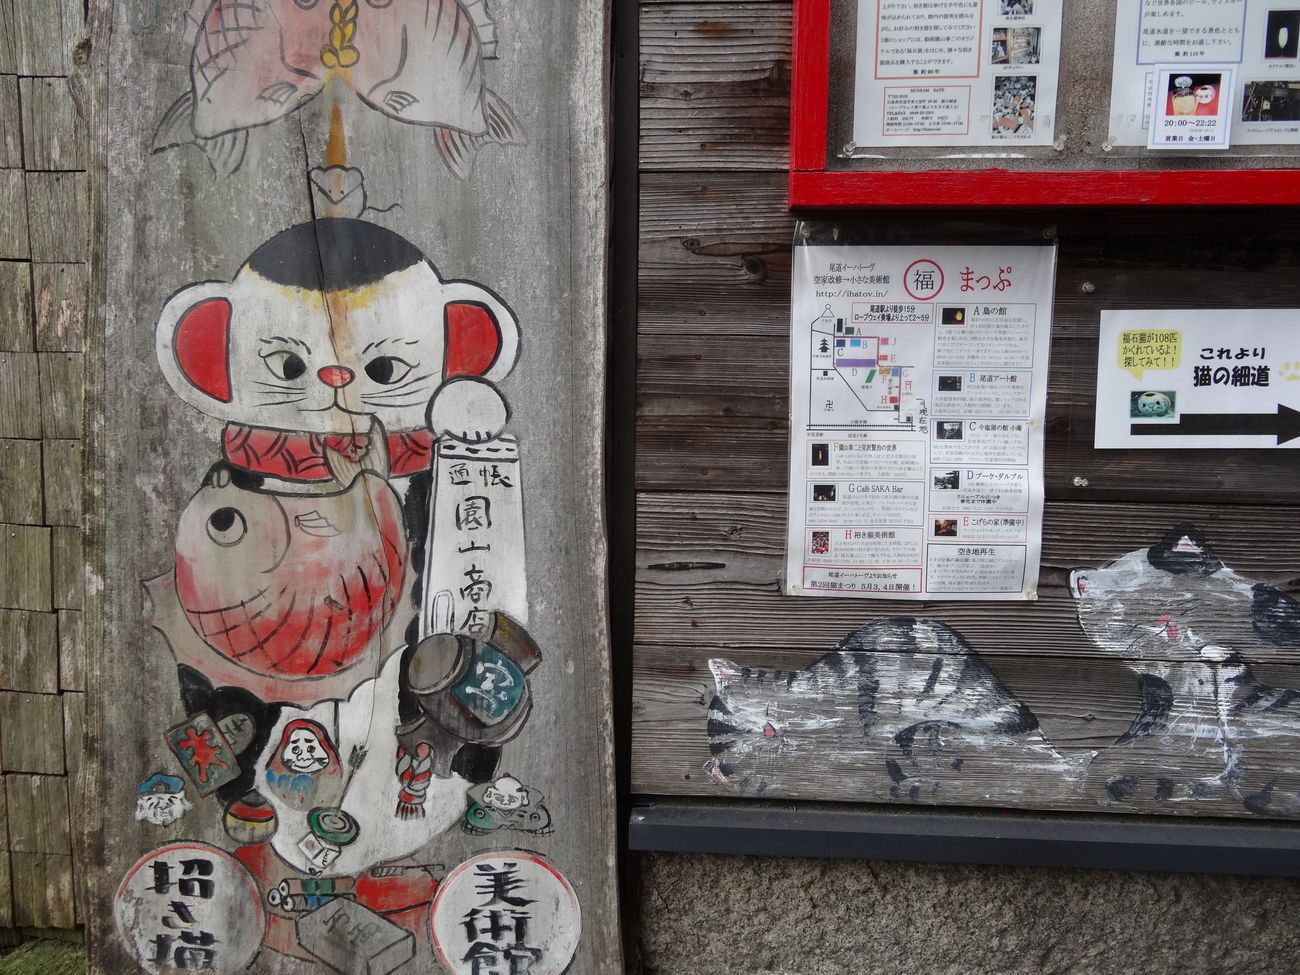 Painted Wall Hiroshima Senkoji Cats Beckoning Cat Fortune Cat 招き猫 尾道 猫の細道